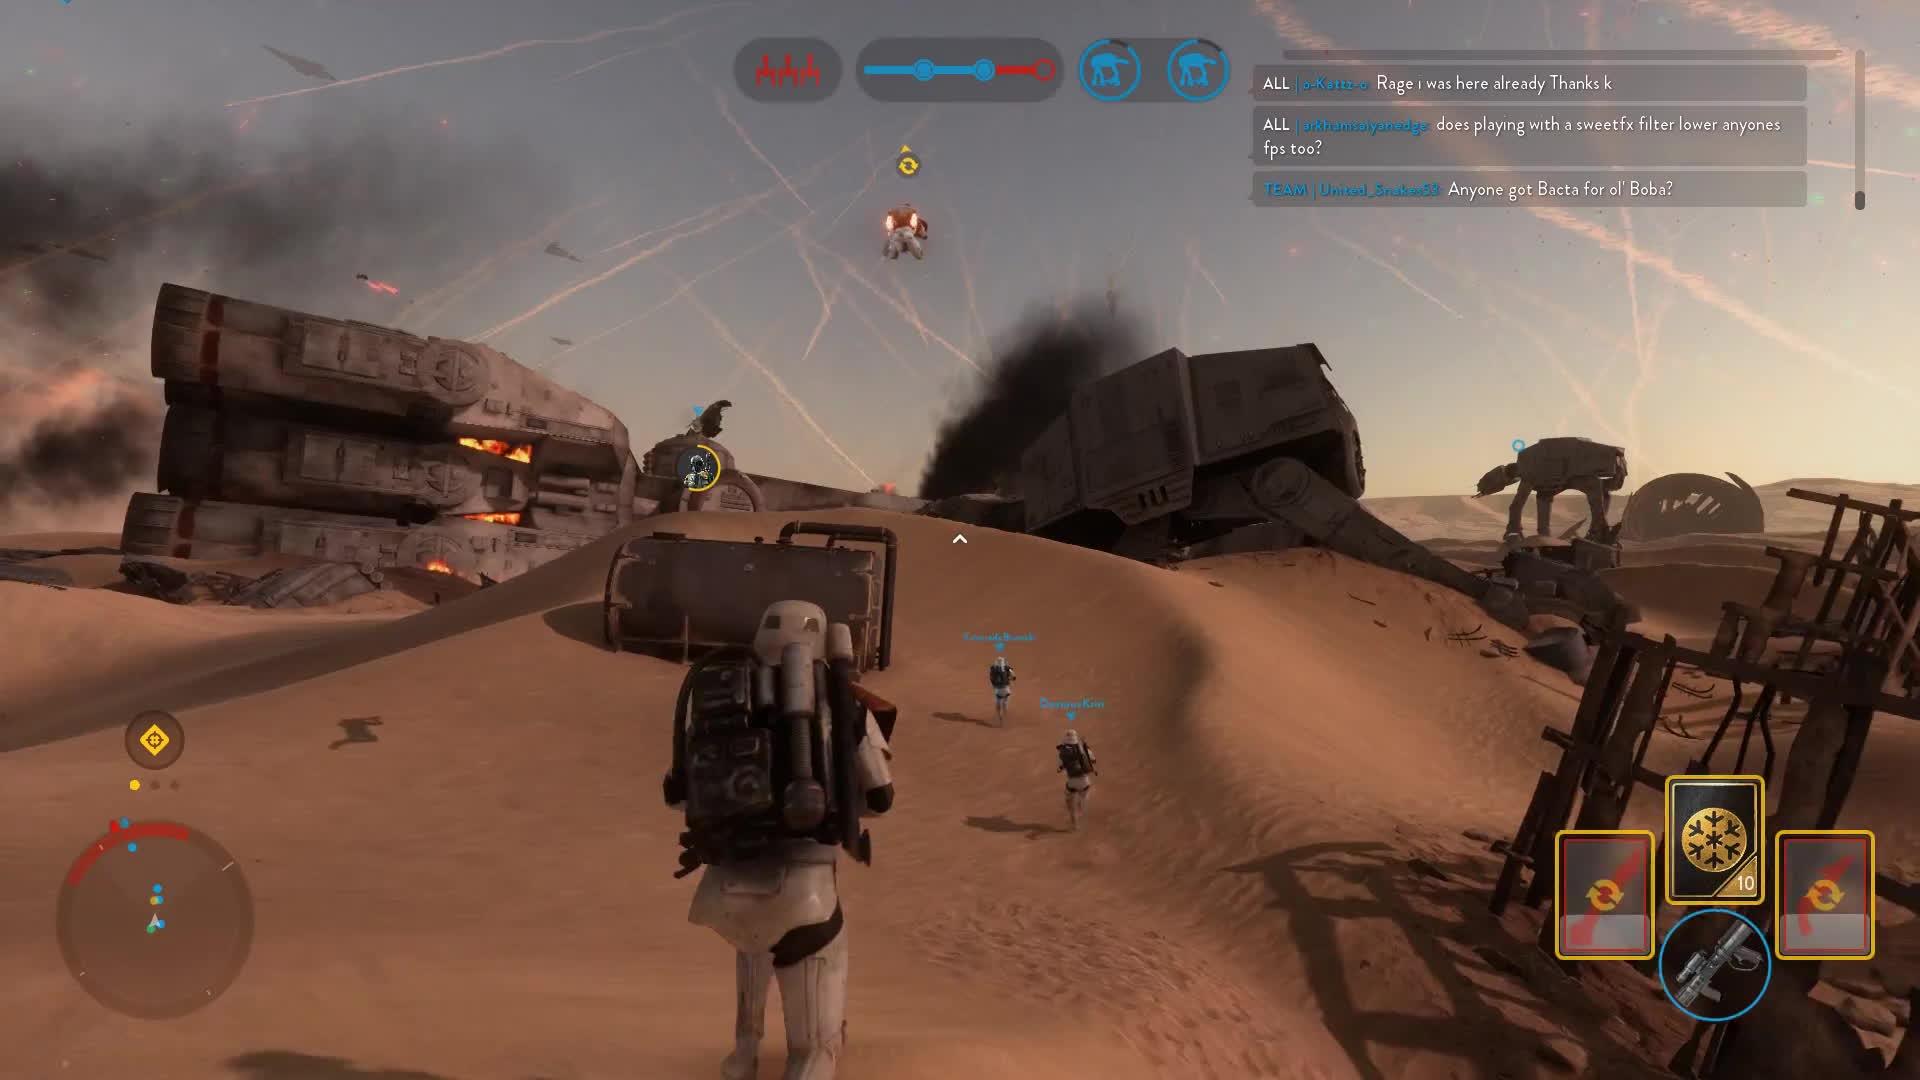 EmpireDidNothingWrong, geforcegtx, shareeverywin, Star Wars Battlefront Close Call GIFs